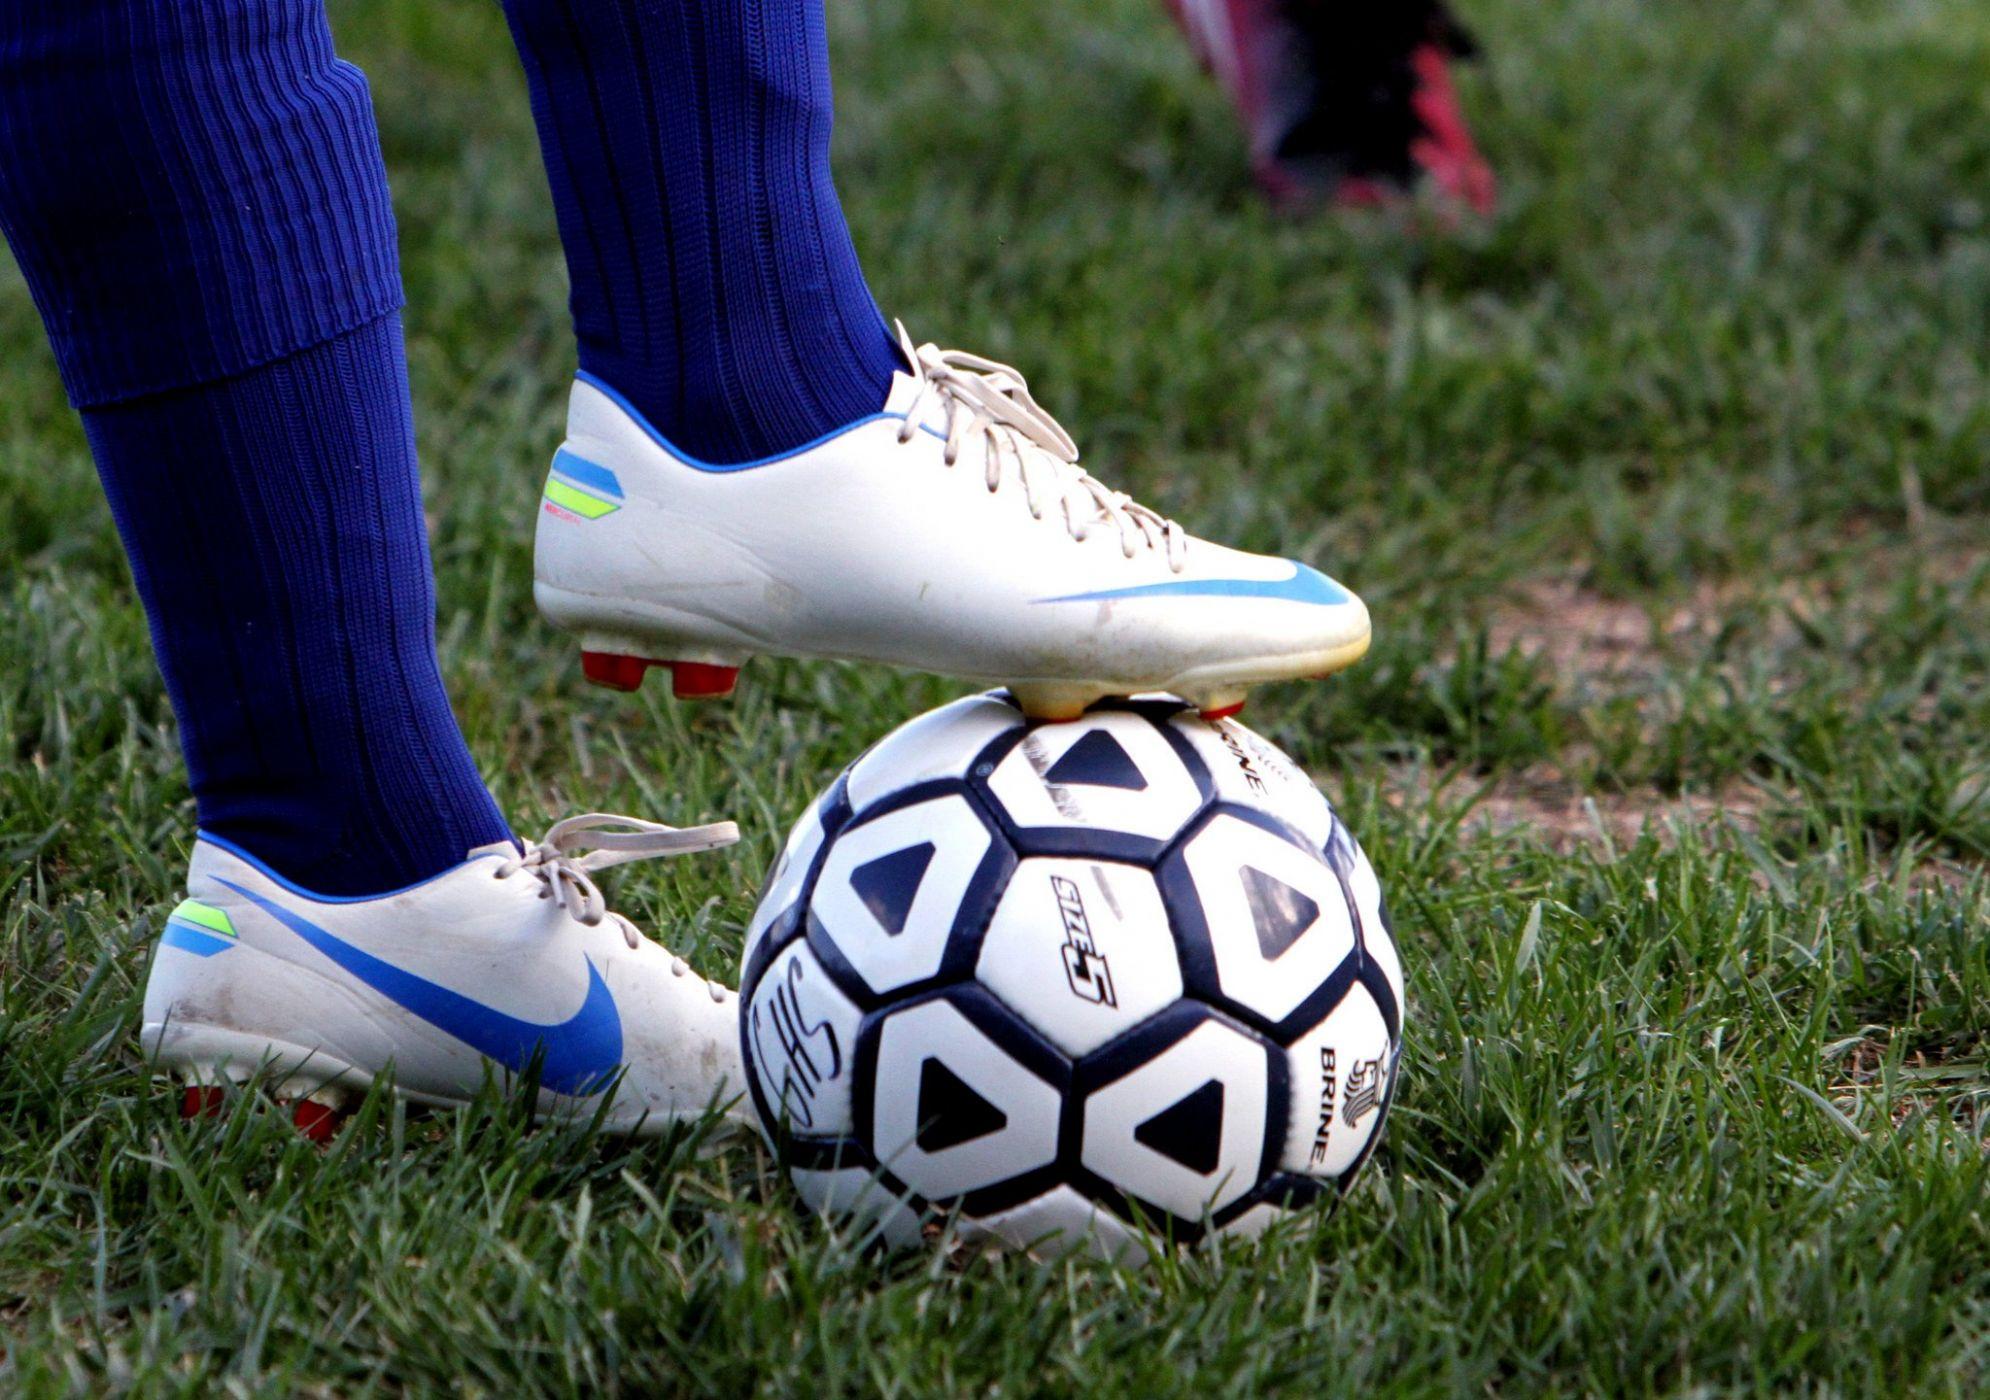 фото на аву про футбол объясняет